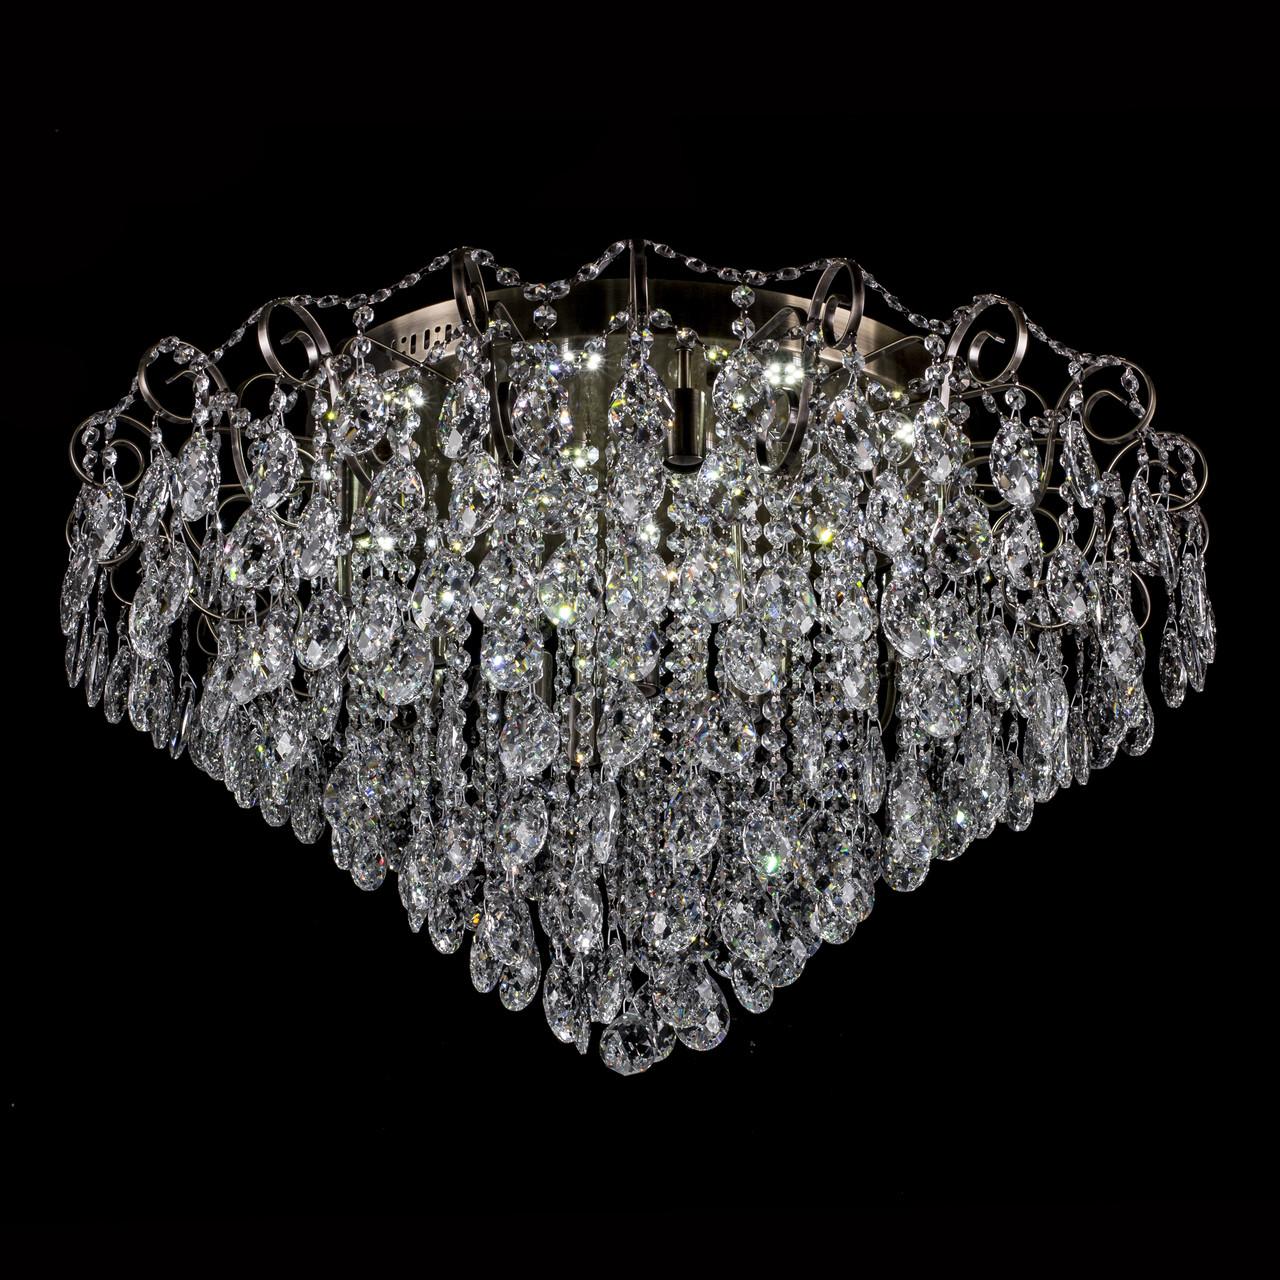 Кришталева люстра классичесская з LED підсвічуванням на 15 лампочок Прометей P5-E1136/15+15/AB